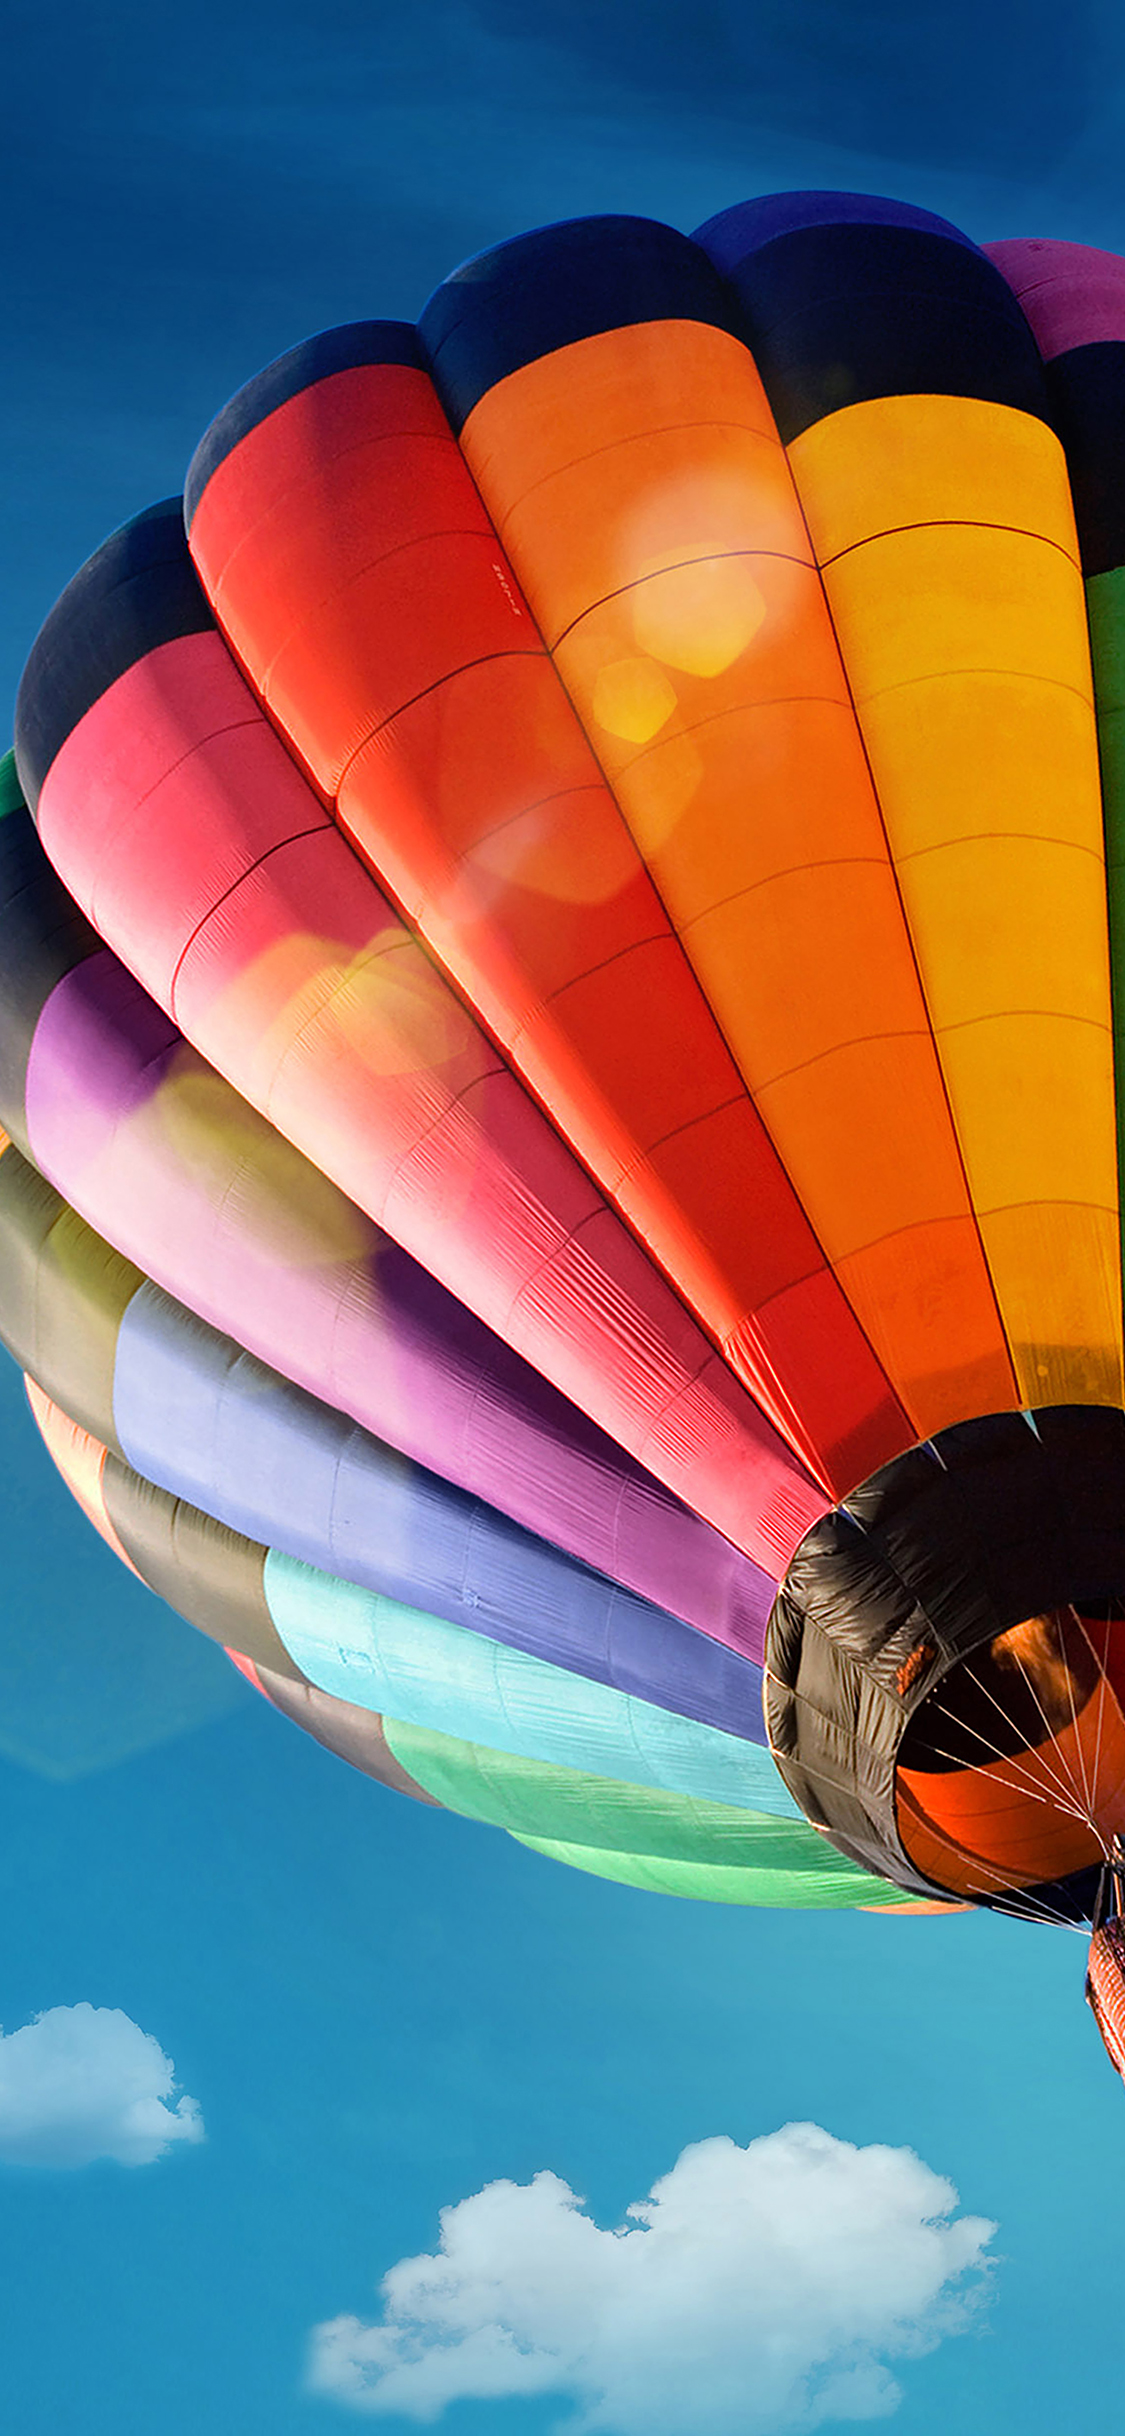 Best Car Wallpapers Batman Mc17 Wallpaper Baloon Pretty Sky Wallpaper